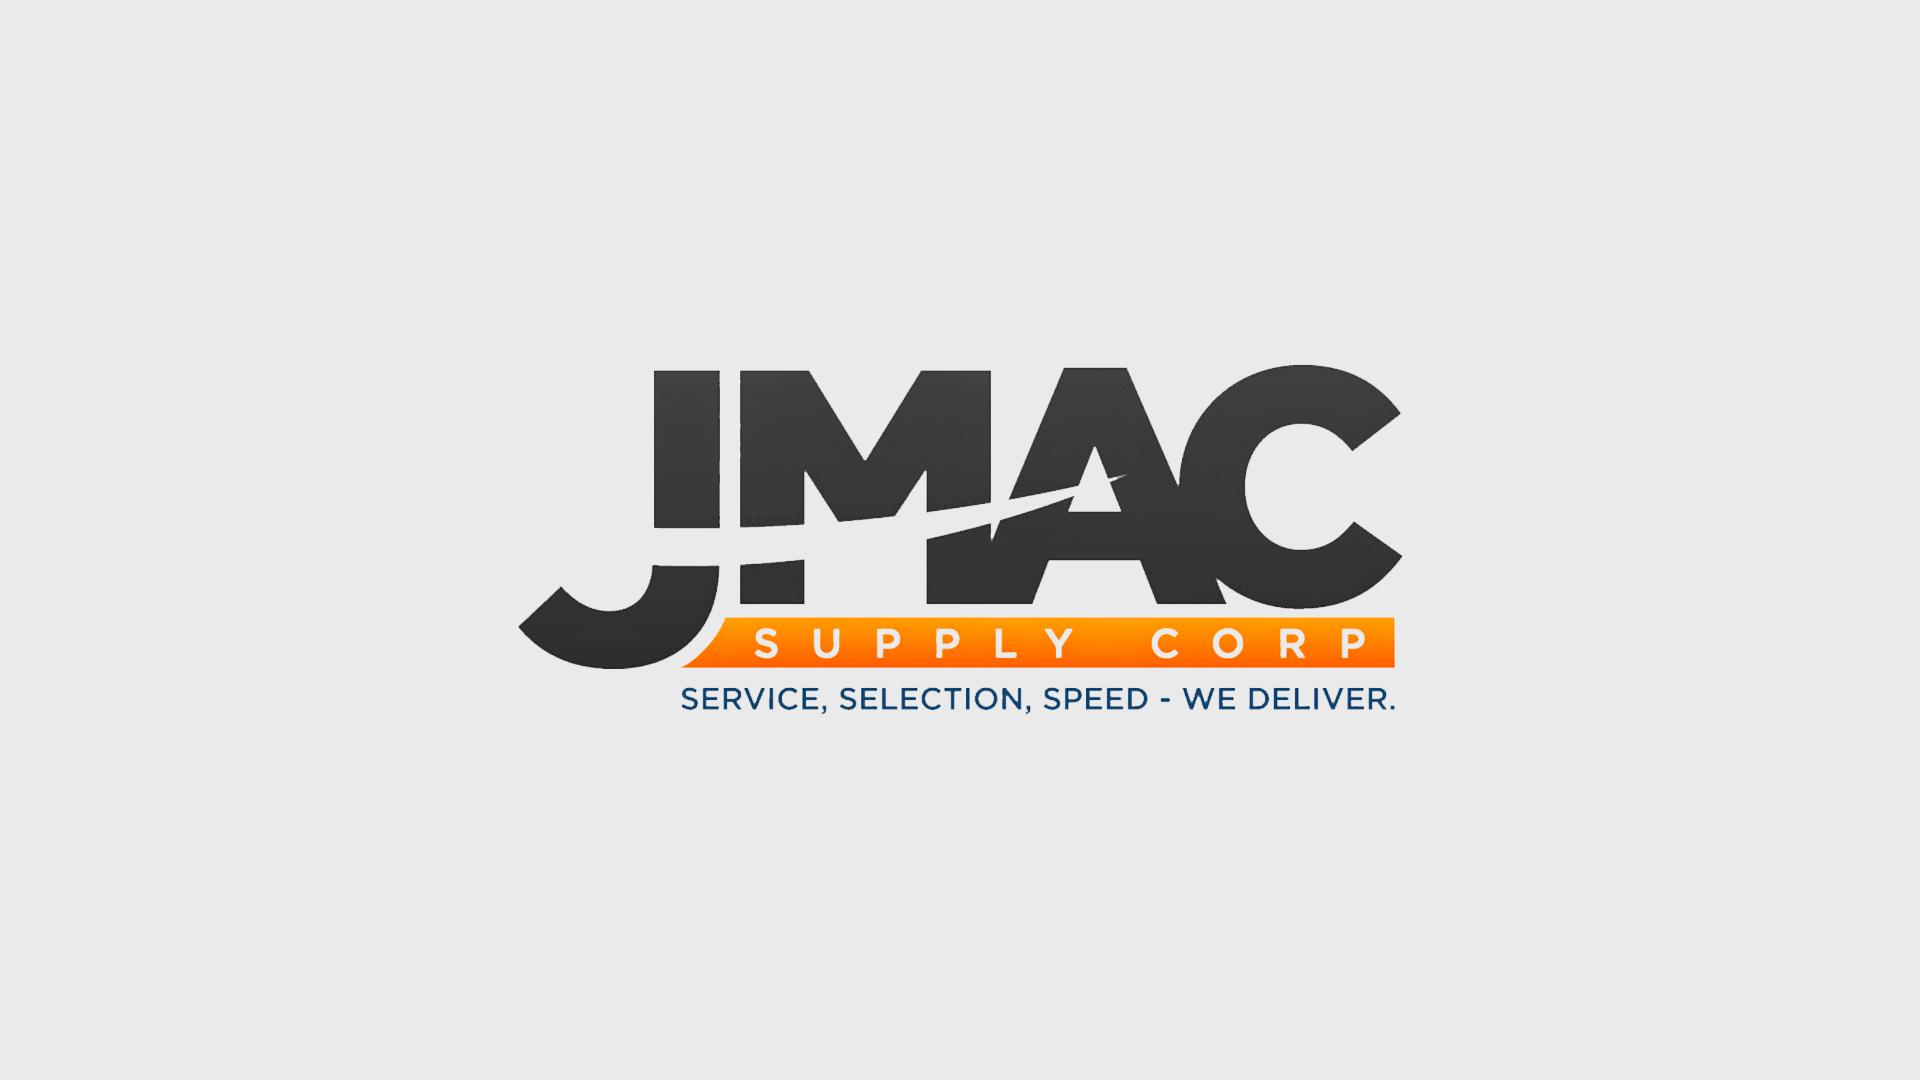 JMAC Supply